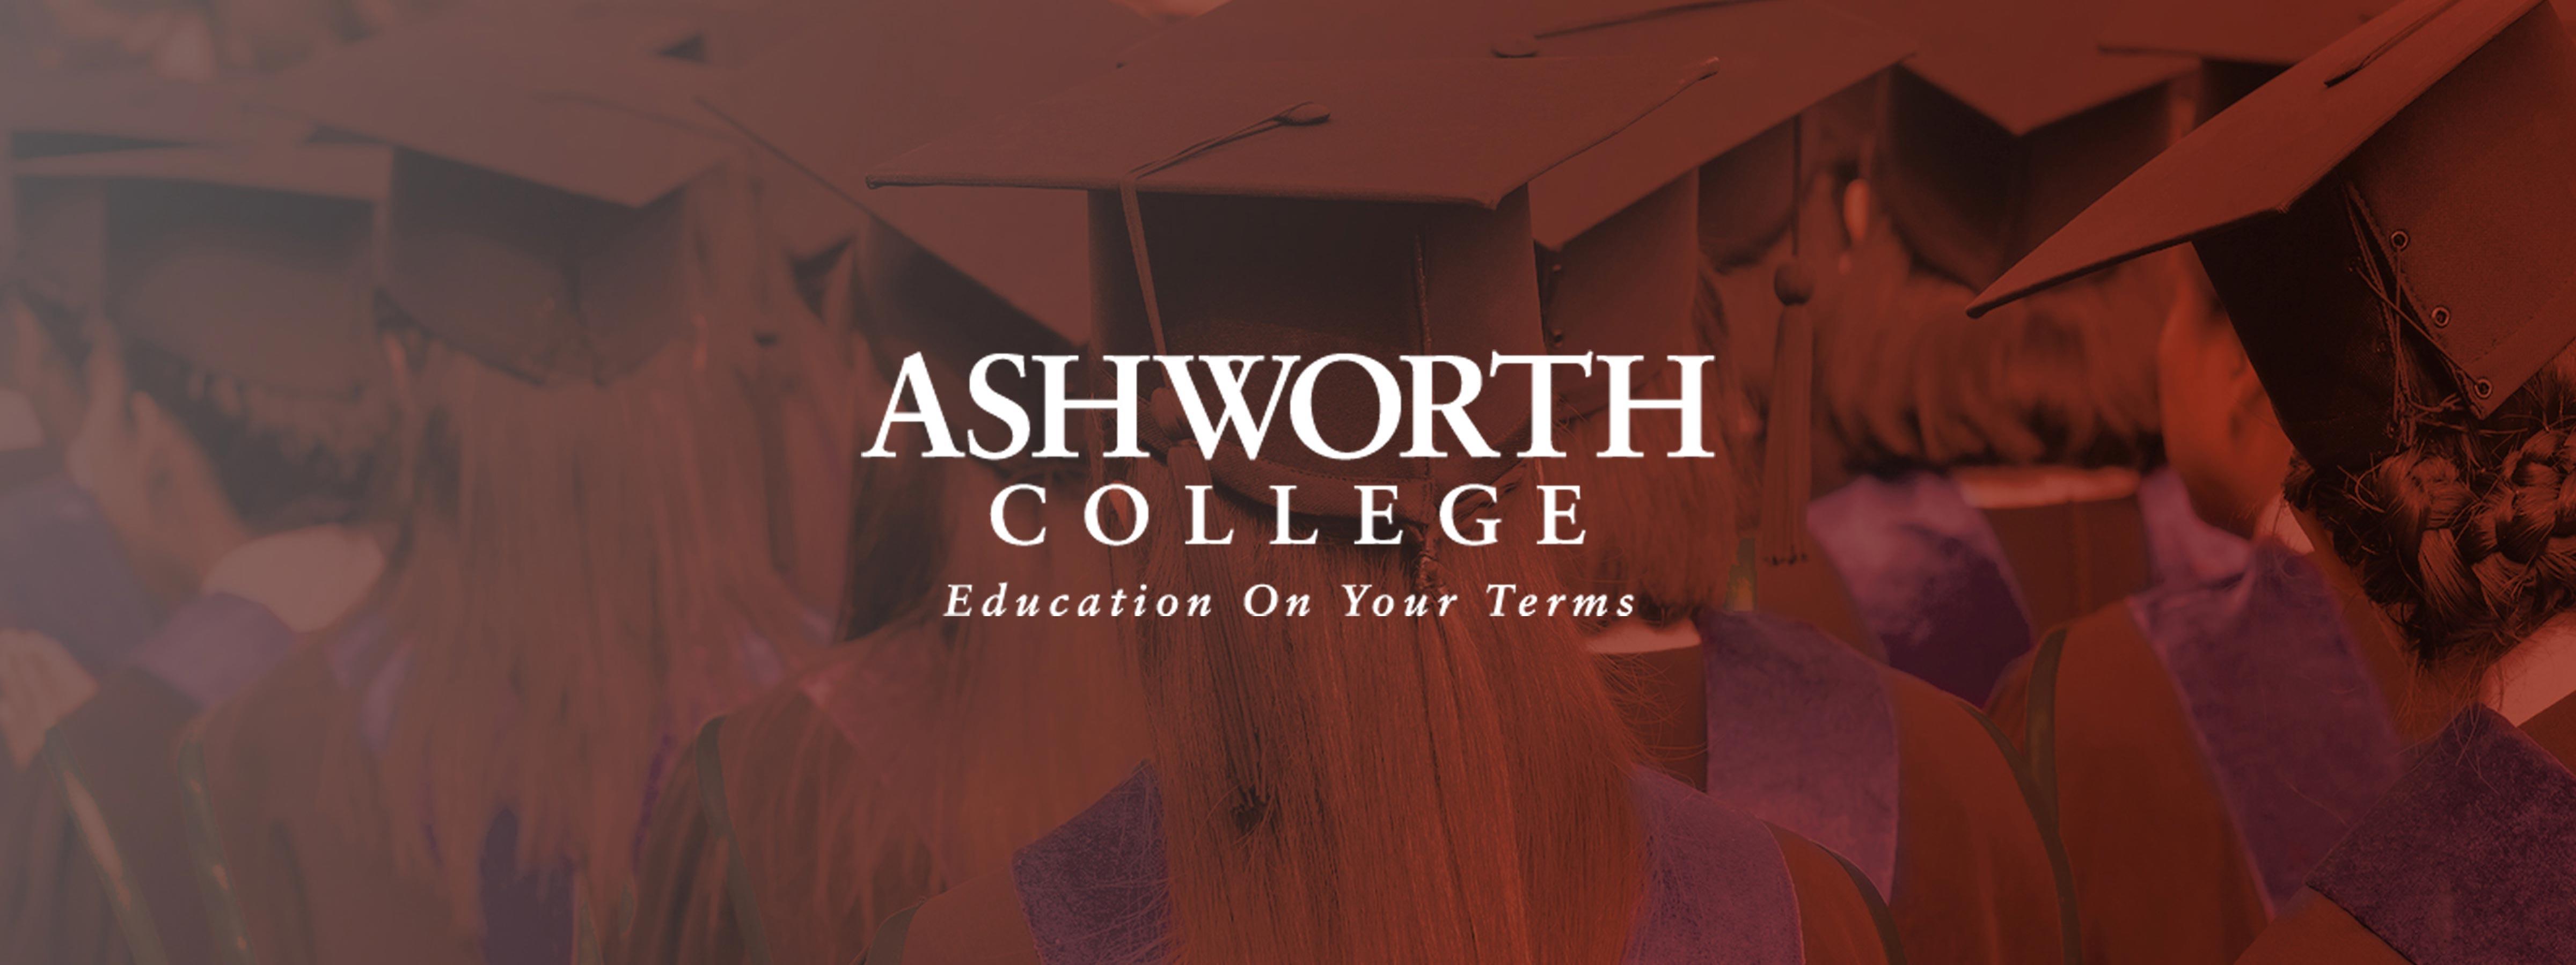 Ashworth_CaseStudy_LP_1-min